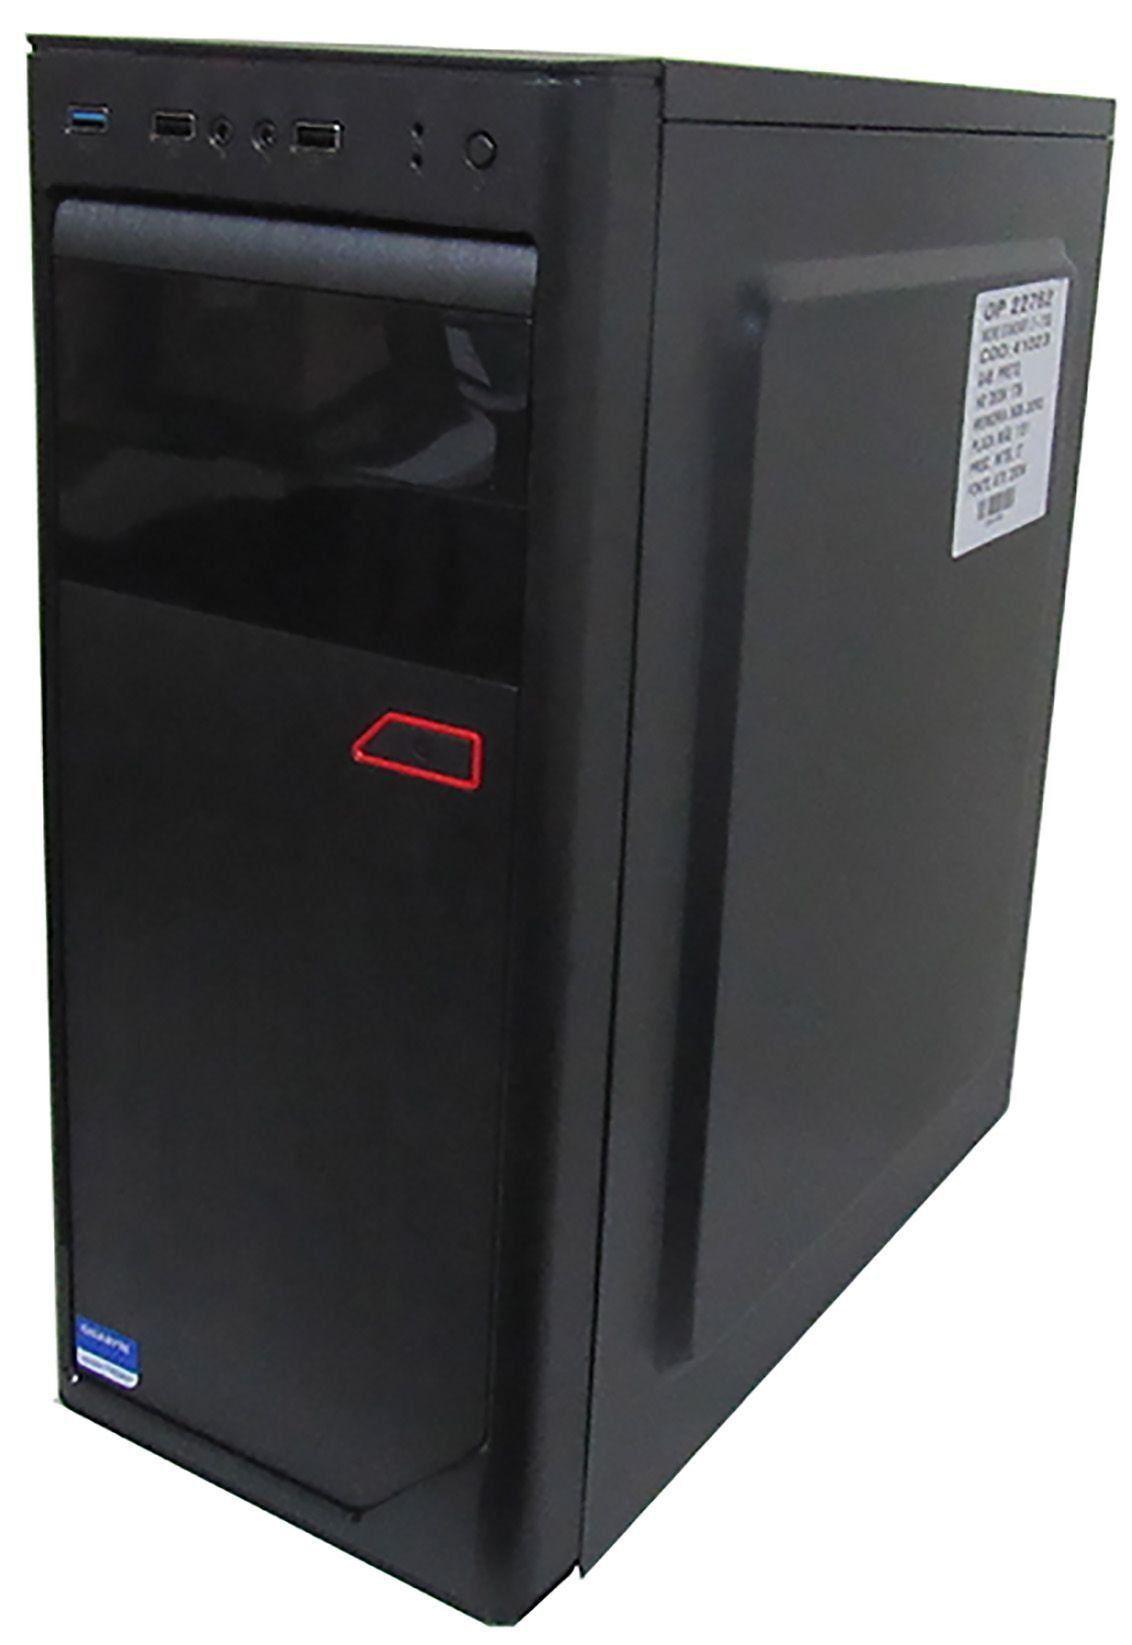 Computador Intel Core i5 4GB 500GB C/ Monitor LED 21.5 AOC Business Rei da Rede